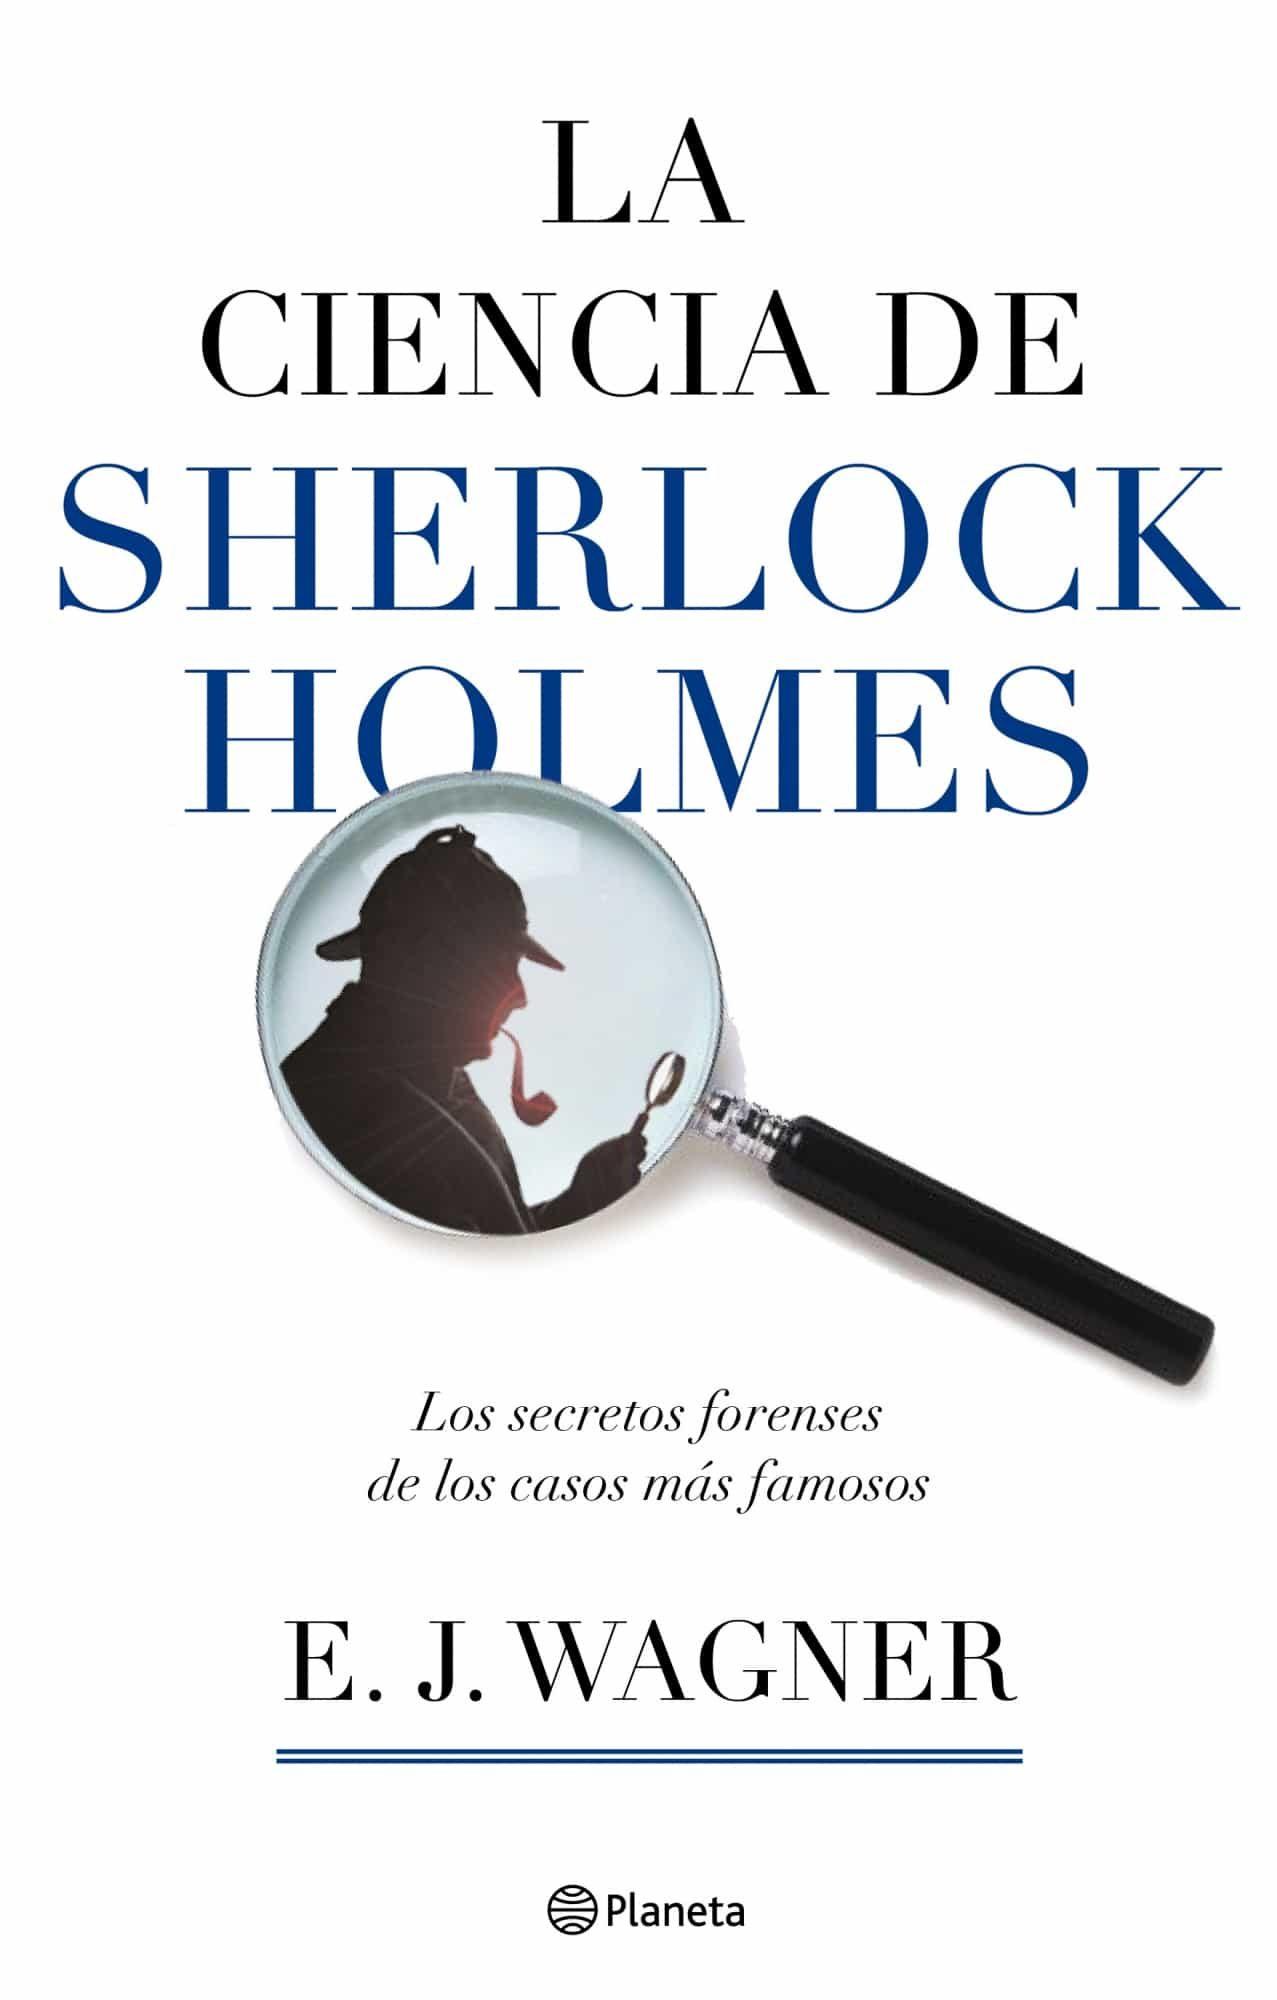 La Ciencia De Sherlock Holmes por E. J. Wagner